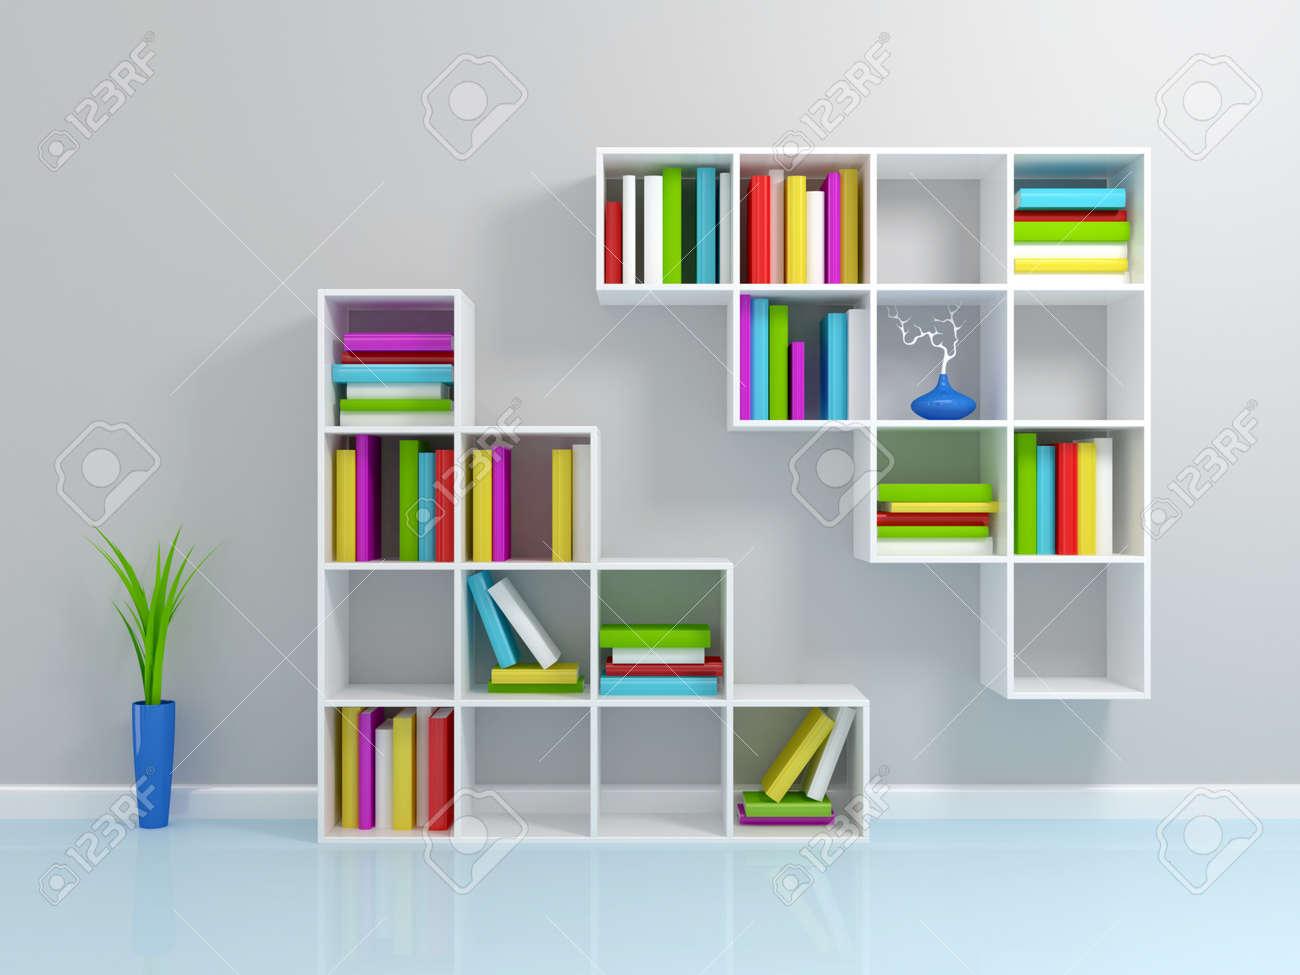 Realistic 3d illustration of modern wooden bookshelf against ston - 3d Bookshelf White Bookshelf With A Colorful Books 3d Rendered